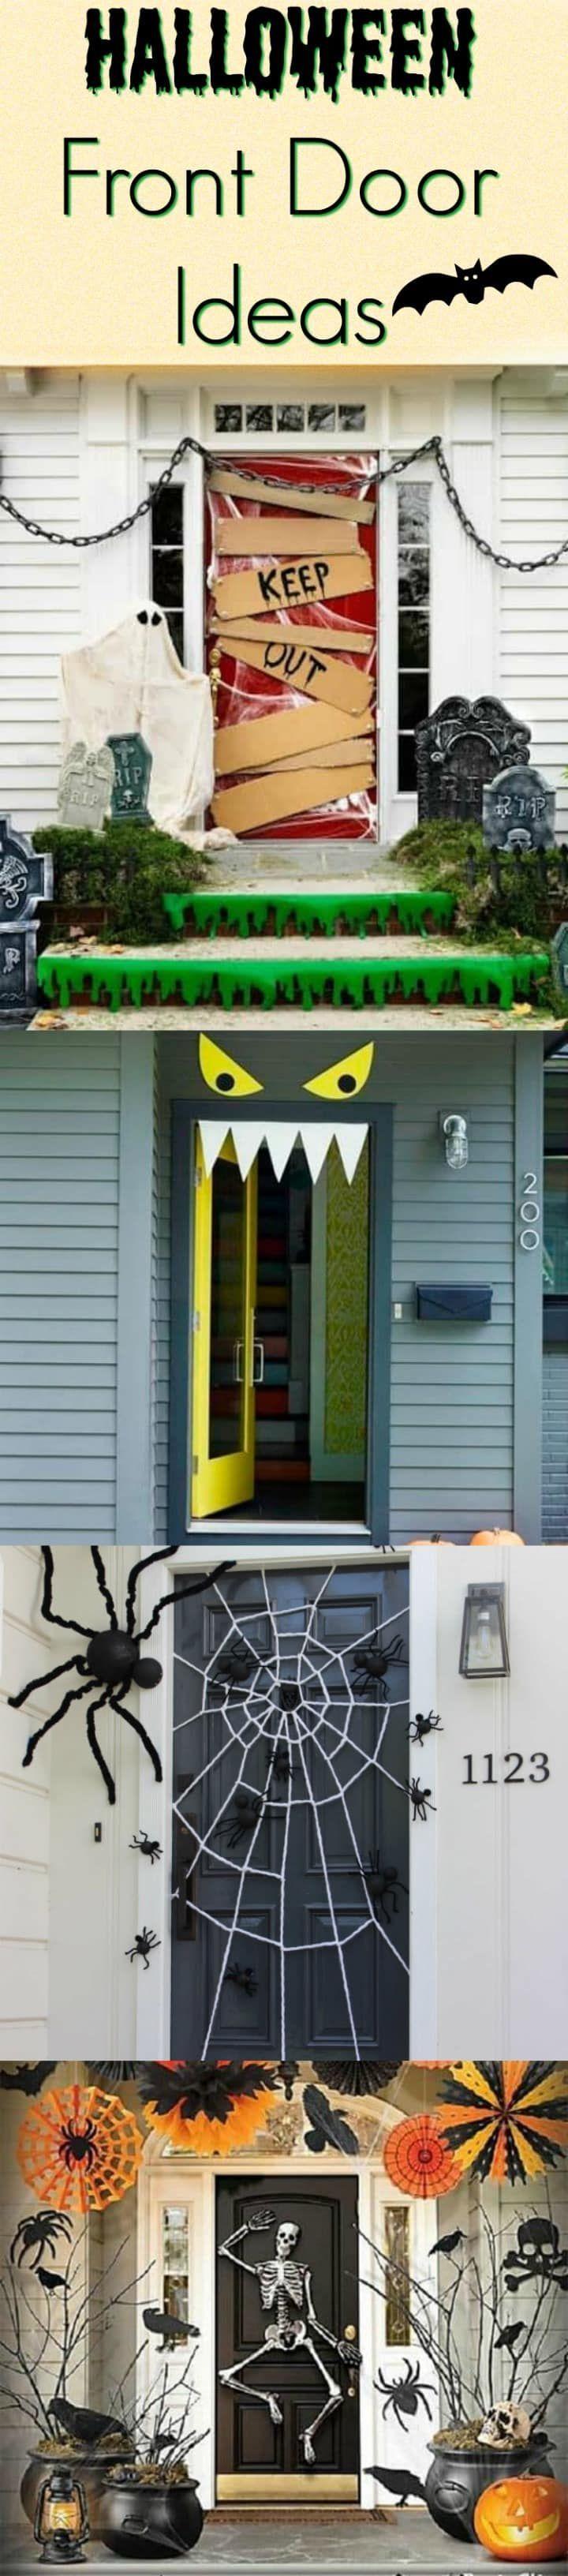 Halloween Front Door Ideas that will transform your porch #halloweendecor